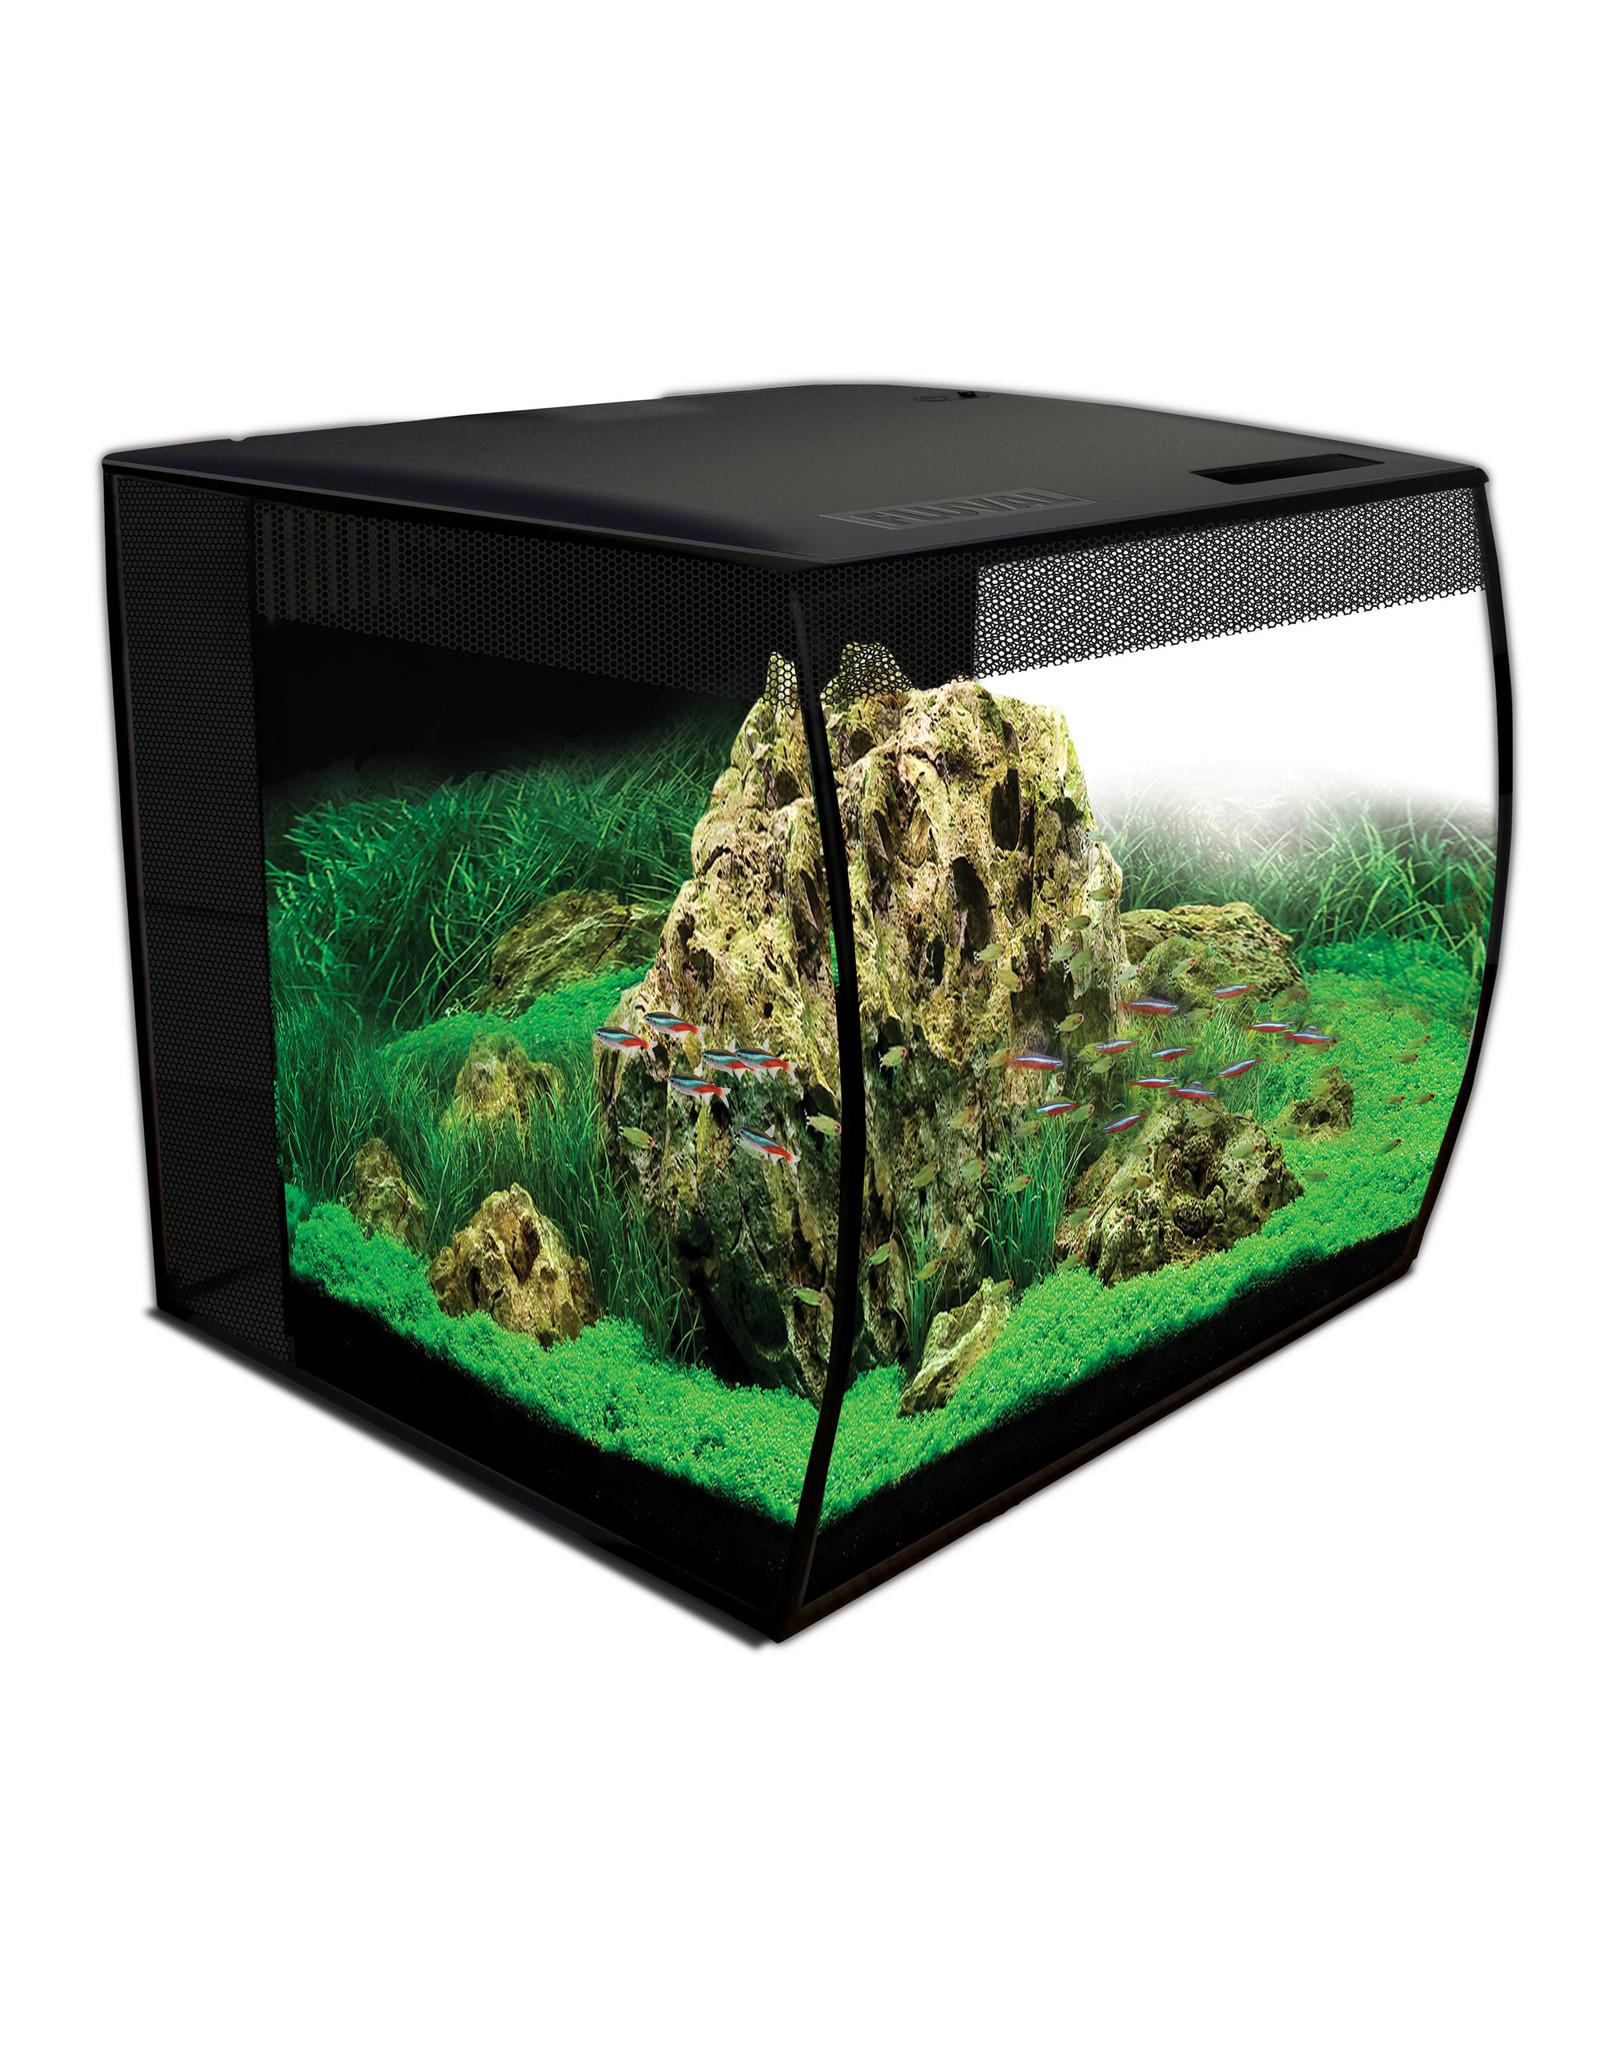 Fluval Fluval FLEX Aquarium Kit - 57 L (15 US gal) Black